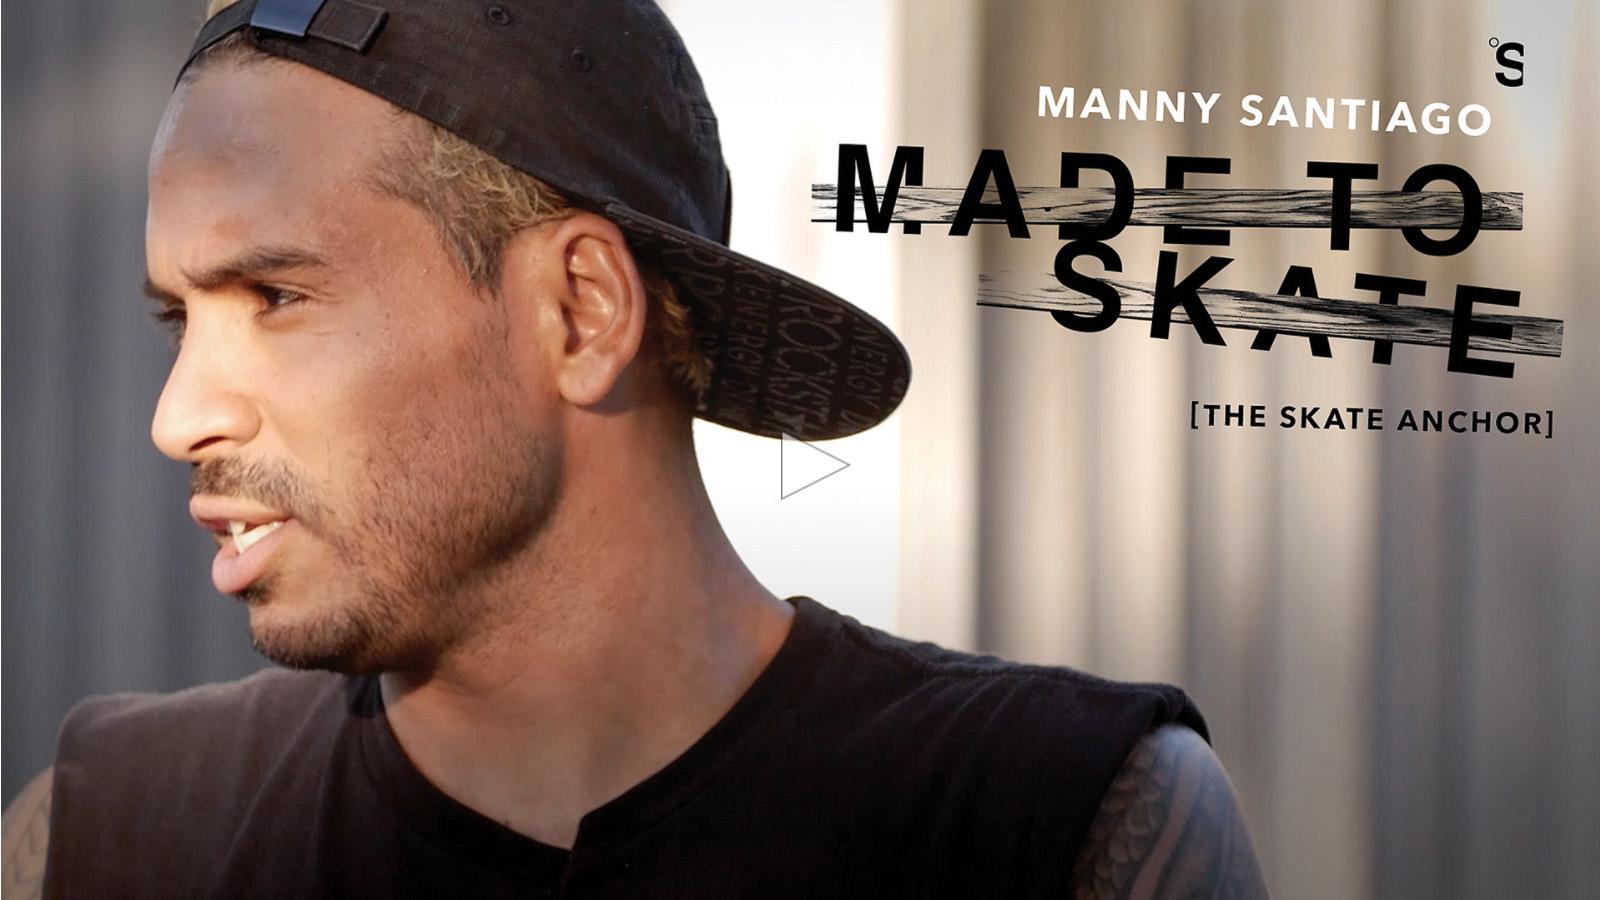 tsm_madetoskate_manny_cp.jpg